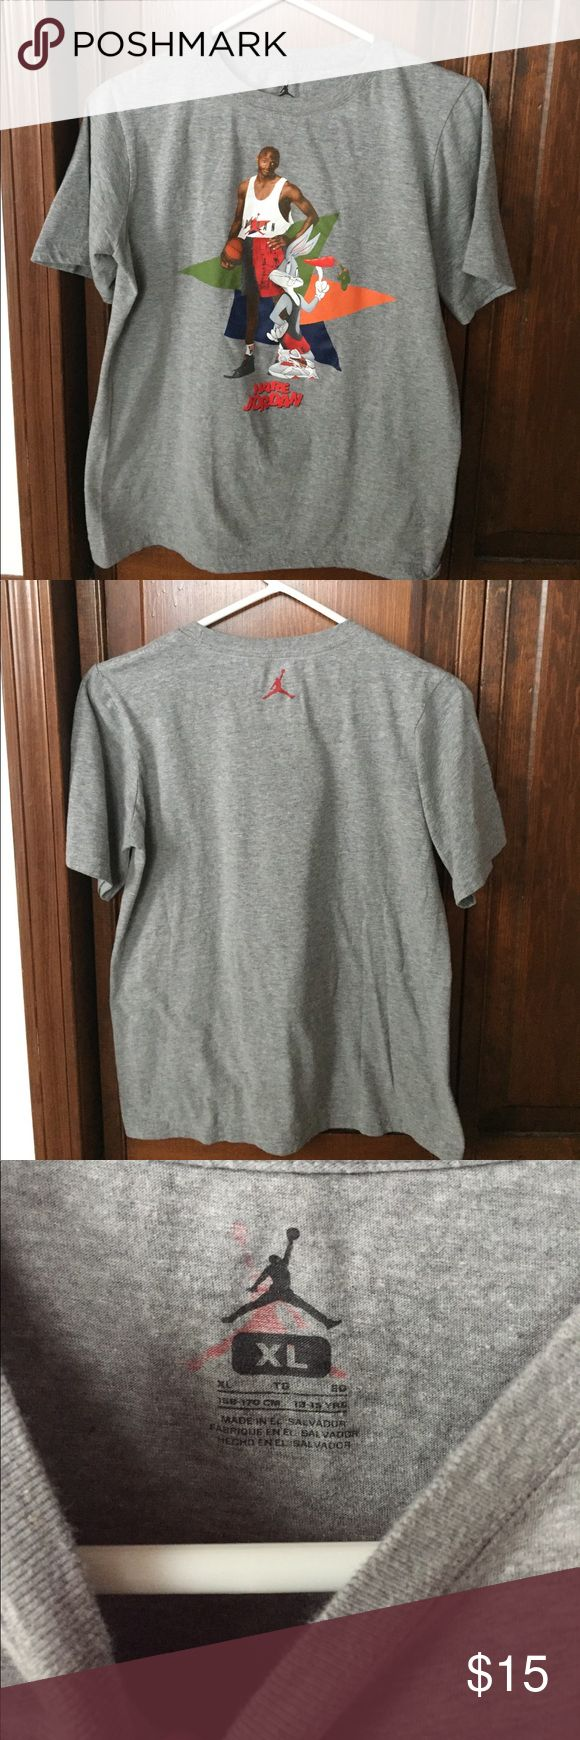 Jordan Tee Jordan Hare Tee like new size XL in boys will fit a women's S Jordan Tops Tees - Short Sleeve